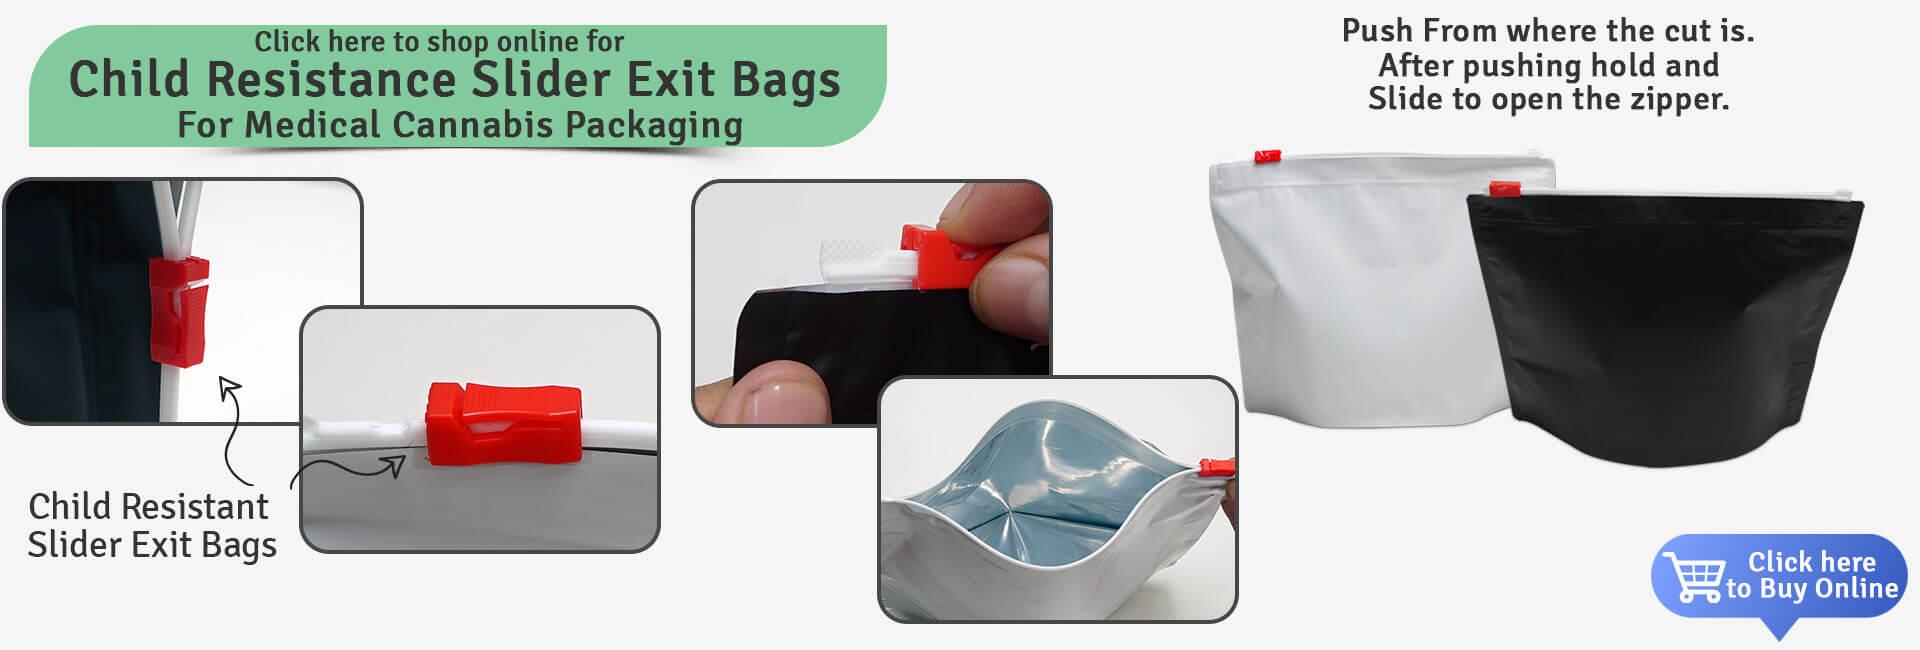 Child Resistance Slider Exit Bags